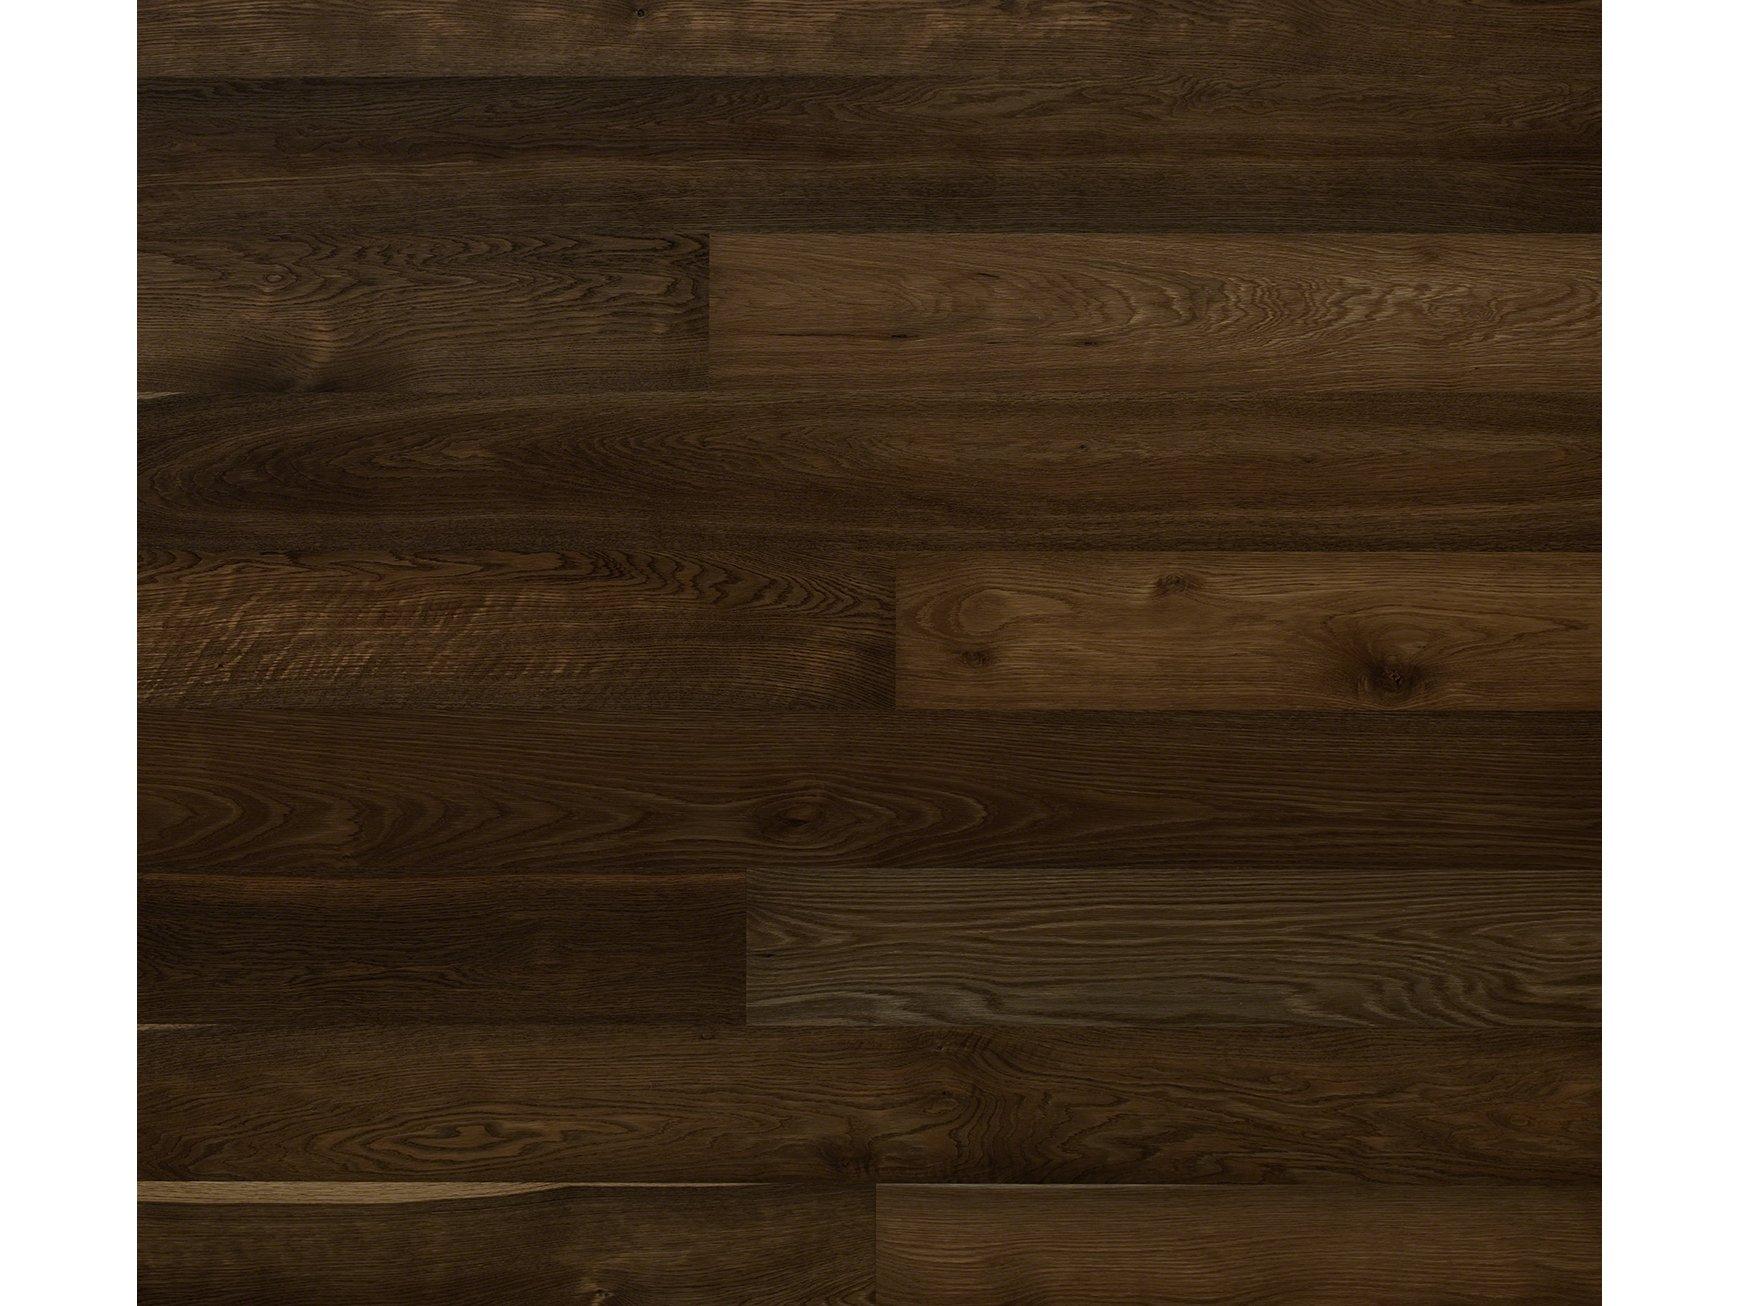 monarch windsor nottingham - Jeffco Flooring